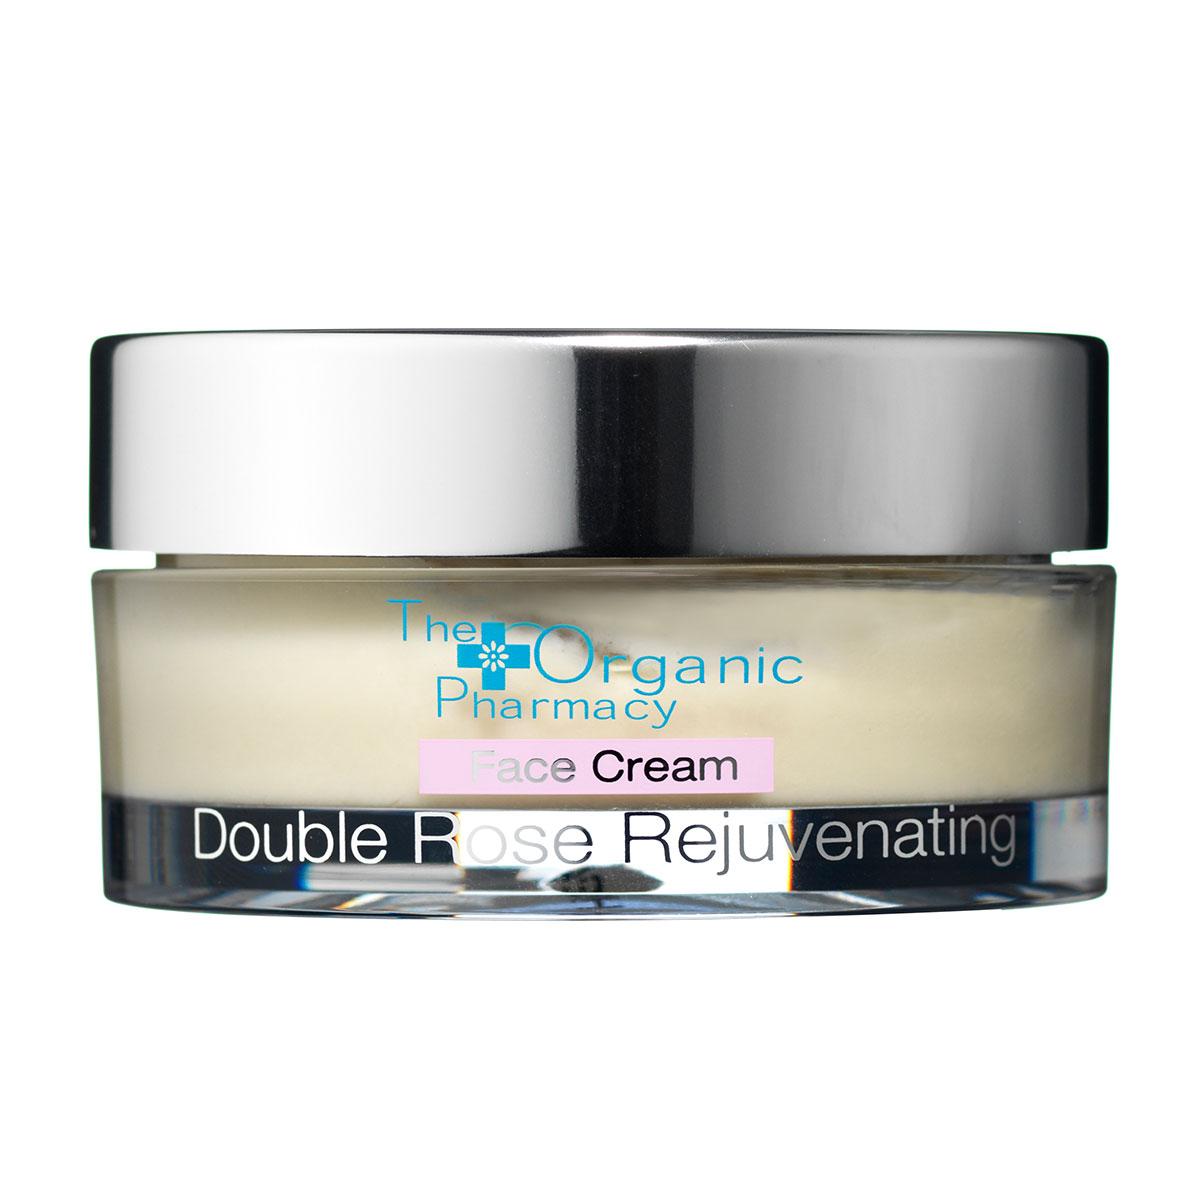 Billede af The Organic Pharmacy Double Rose Rejuvenating Face Cream - 50 ml